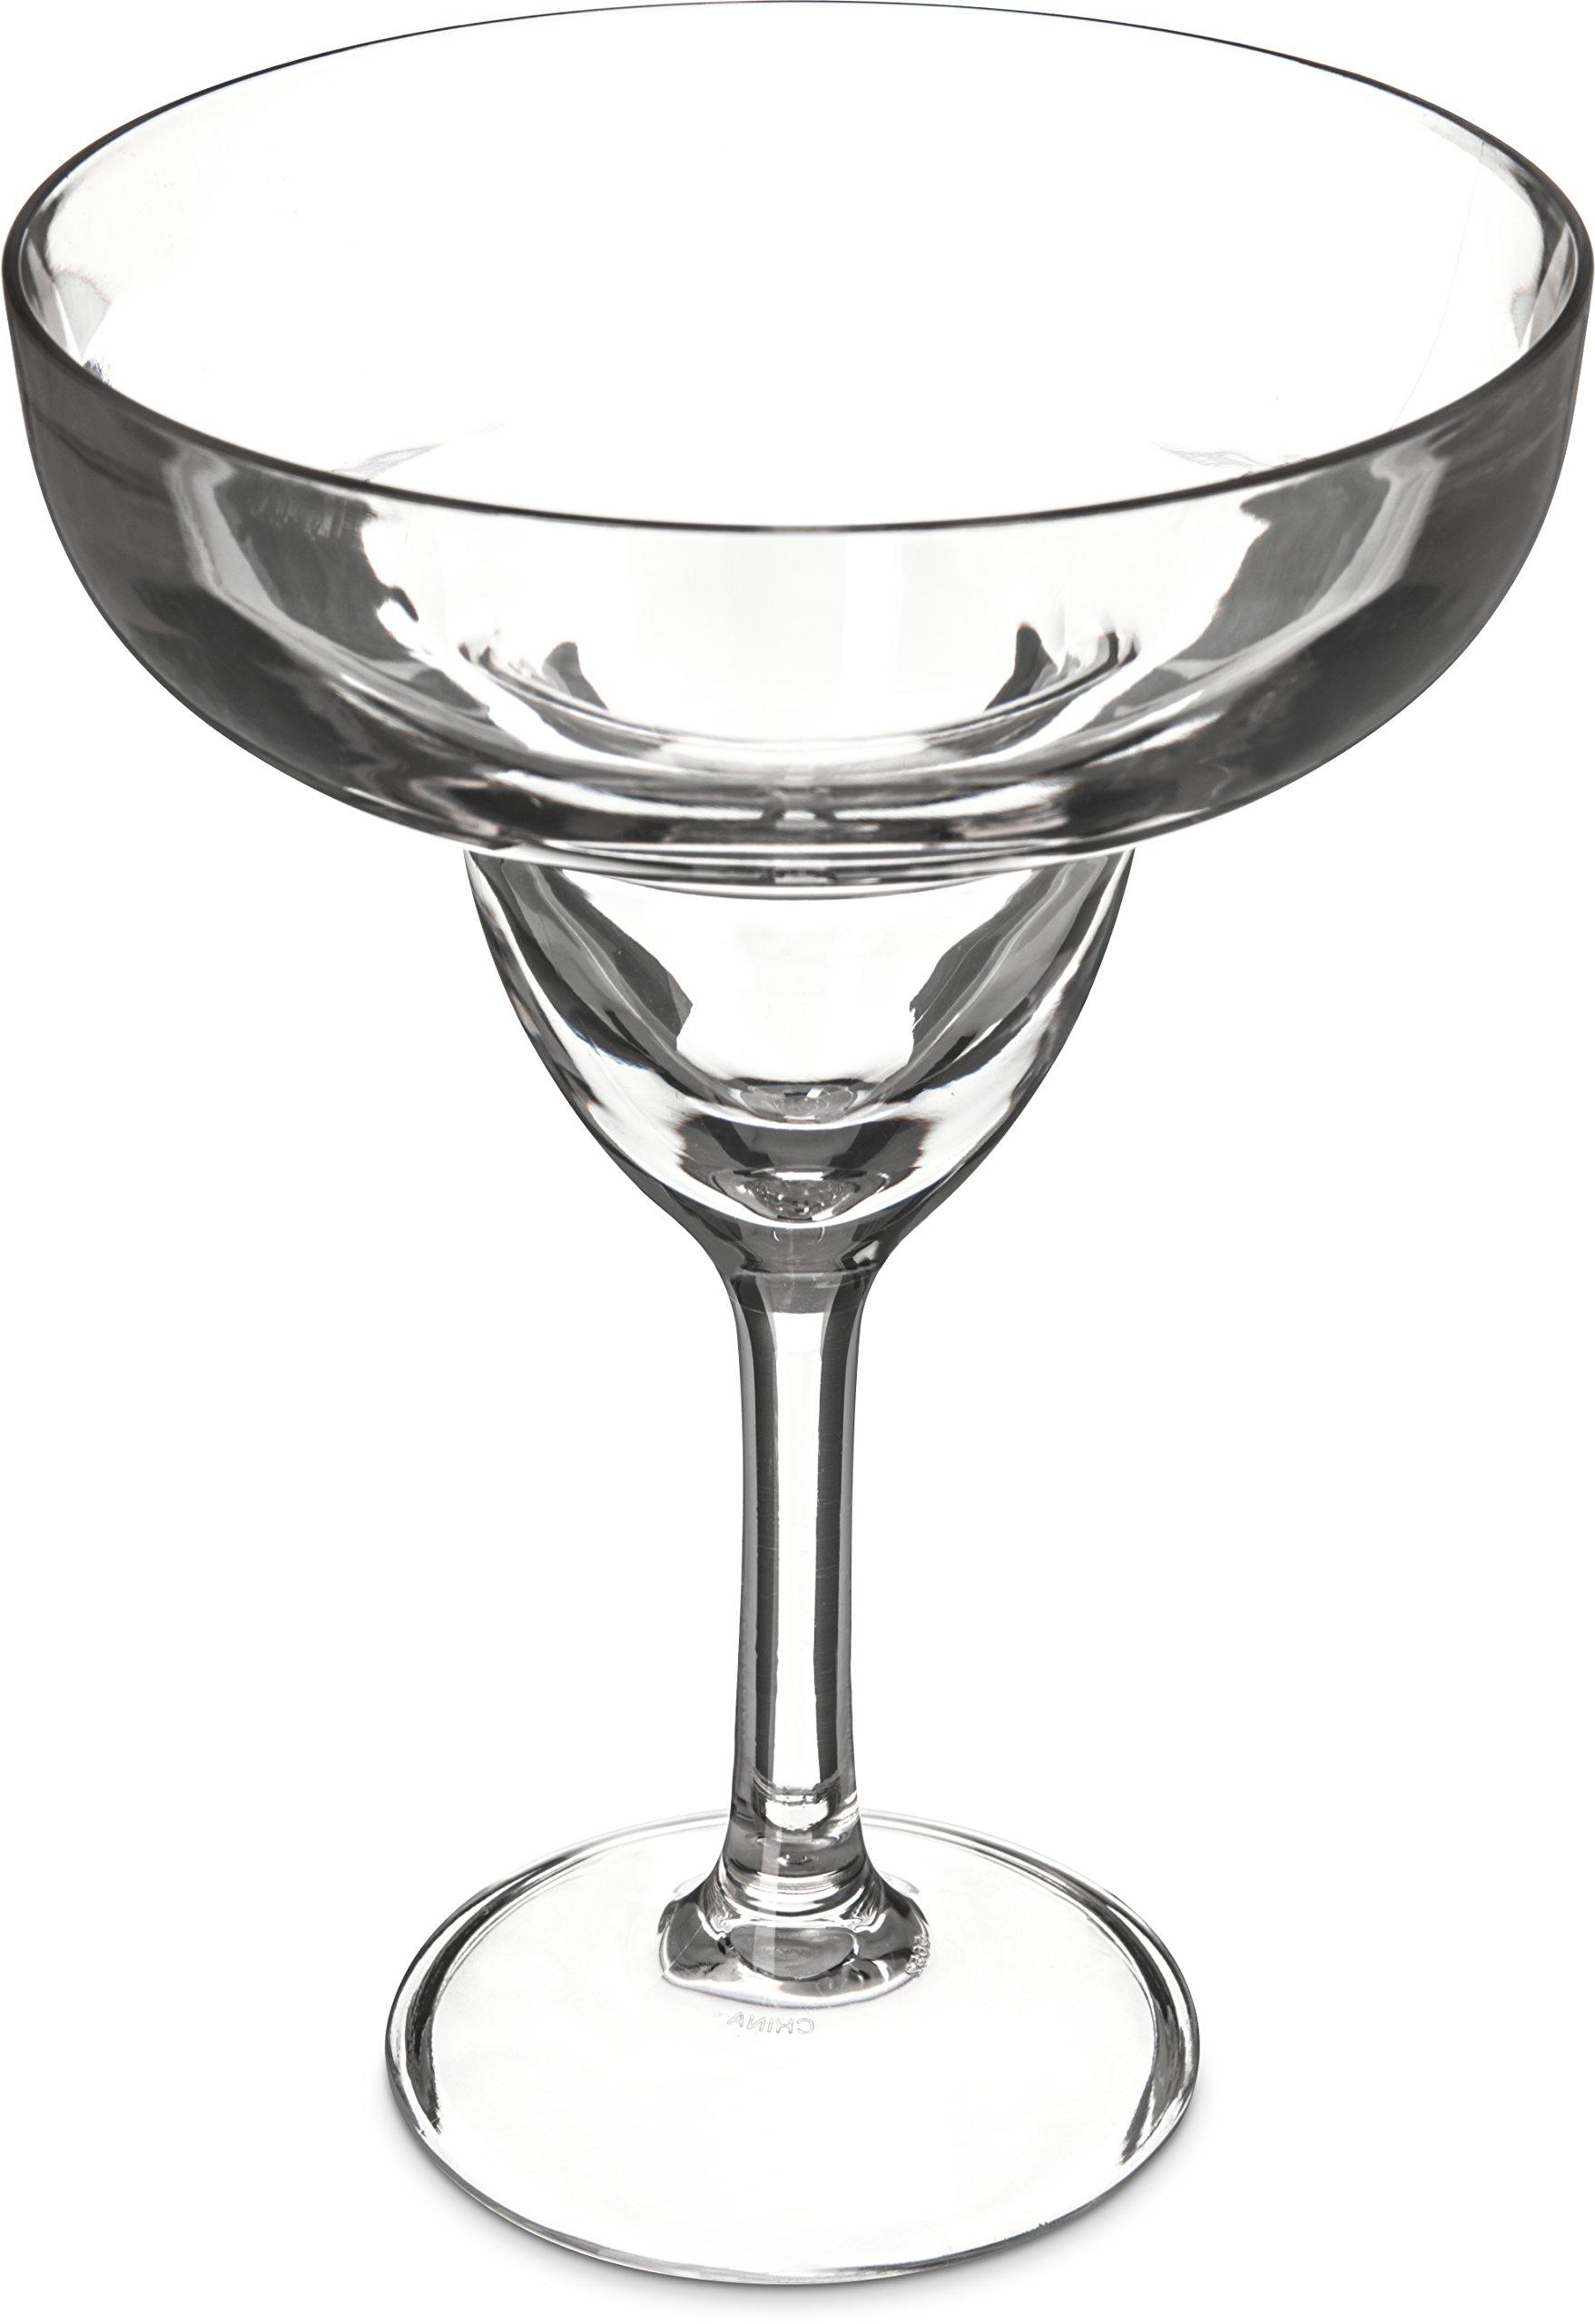 Carlisle 565207 Shatter-Resistant Plastic Margarita Glass, 16 oz, Clear (Pack of 24)